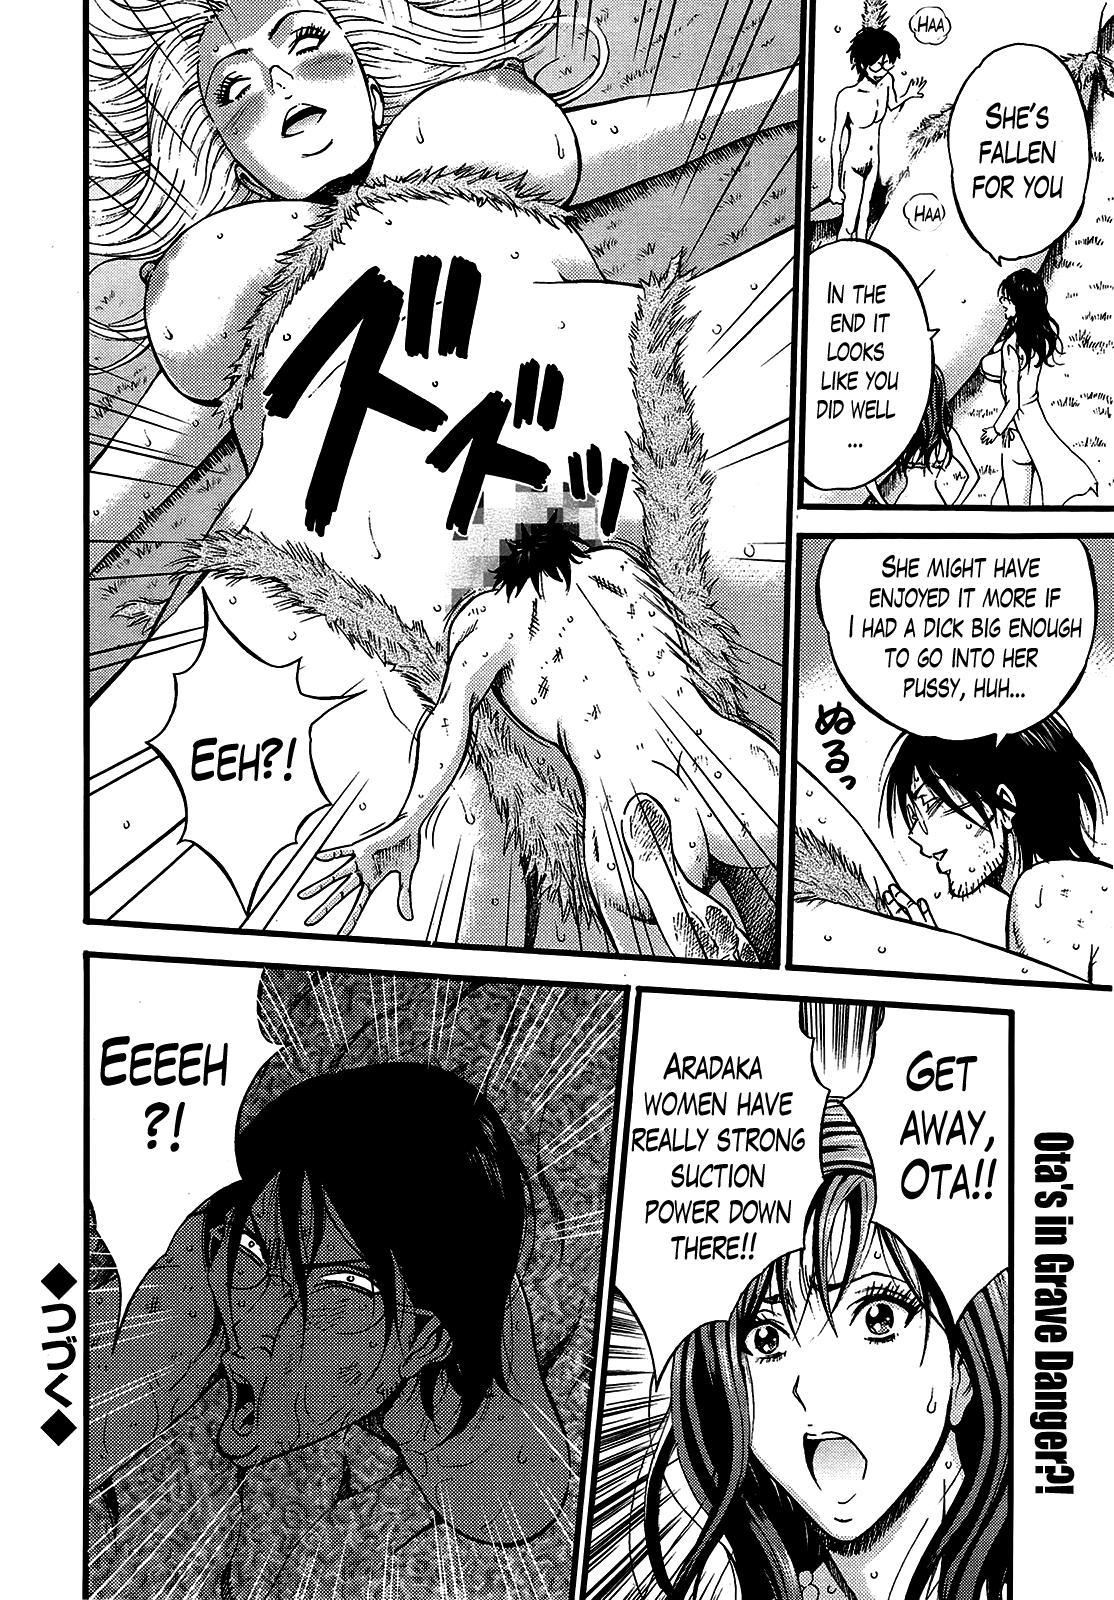 Kigenzen 10000 Nen no Ota   The Otaku in 10,000 B.C. Ch. 1-22 326